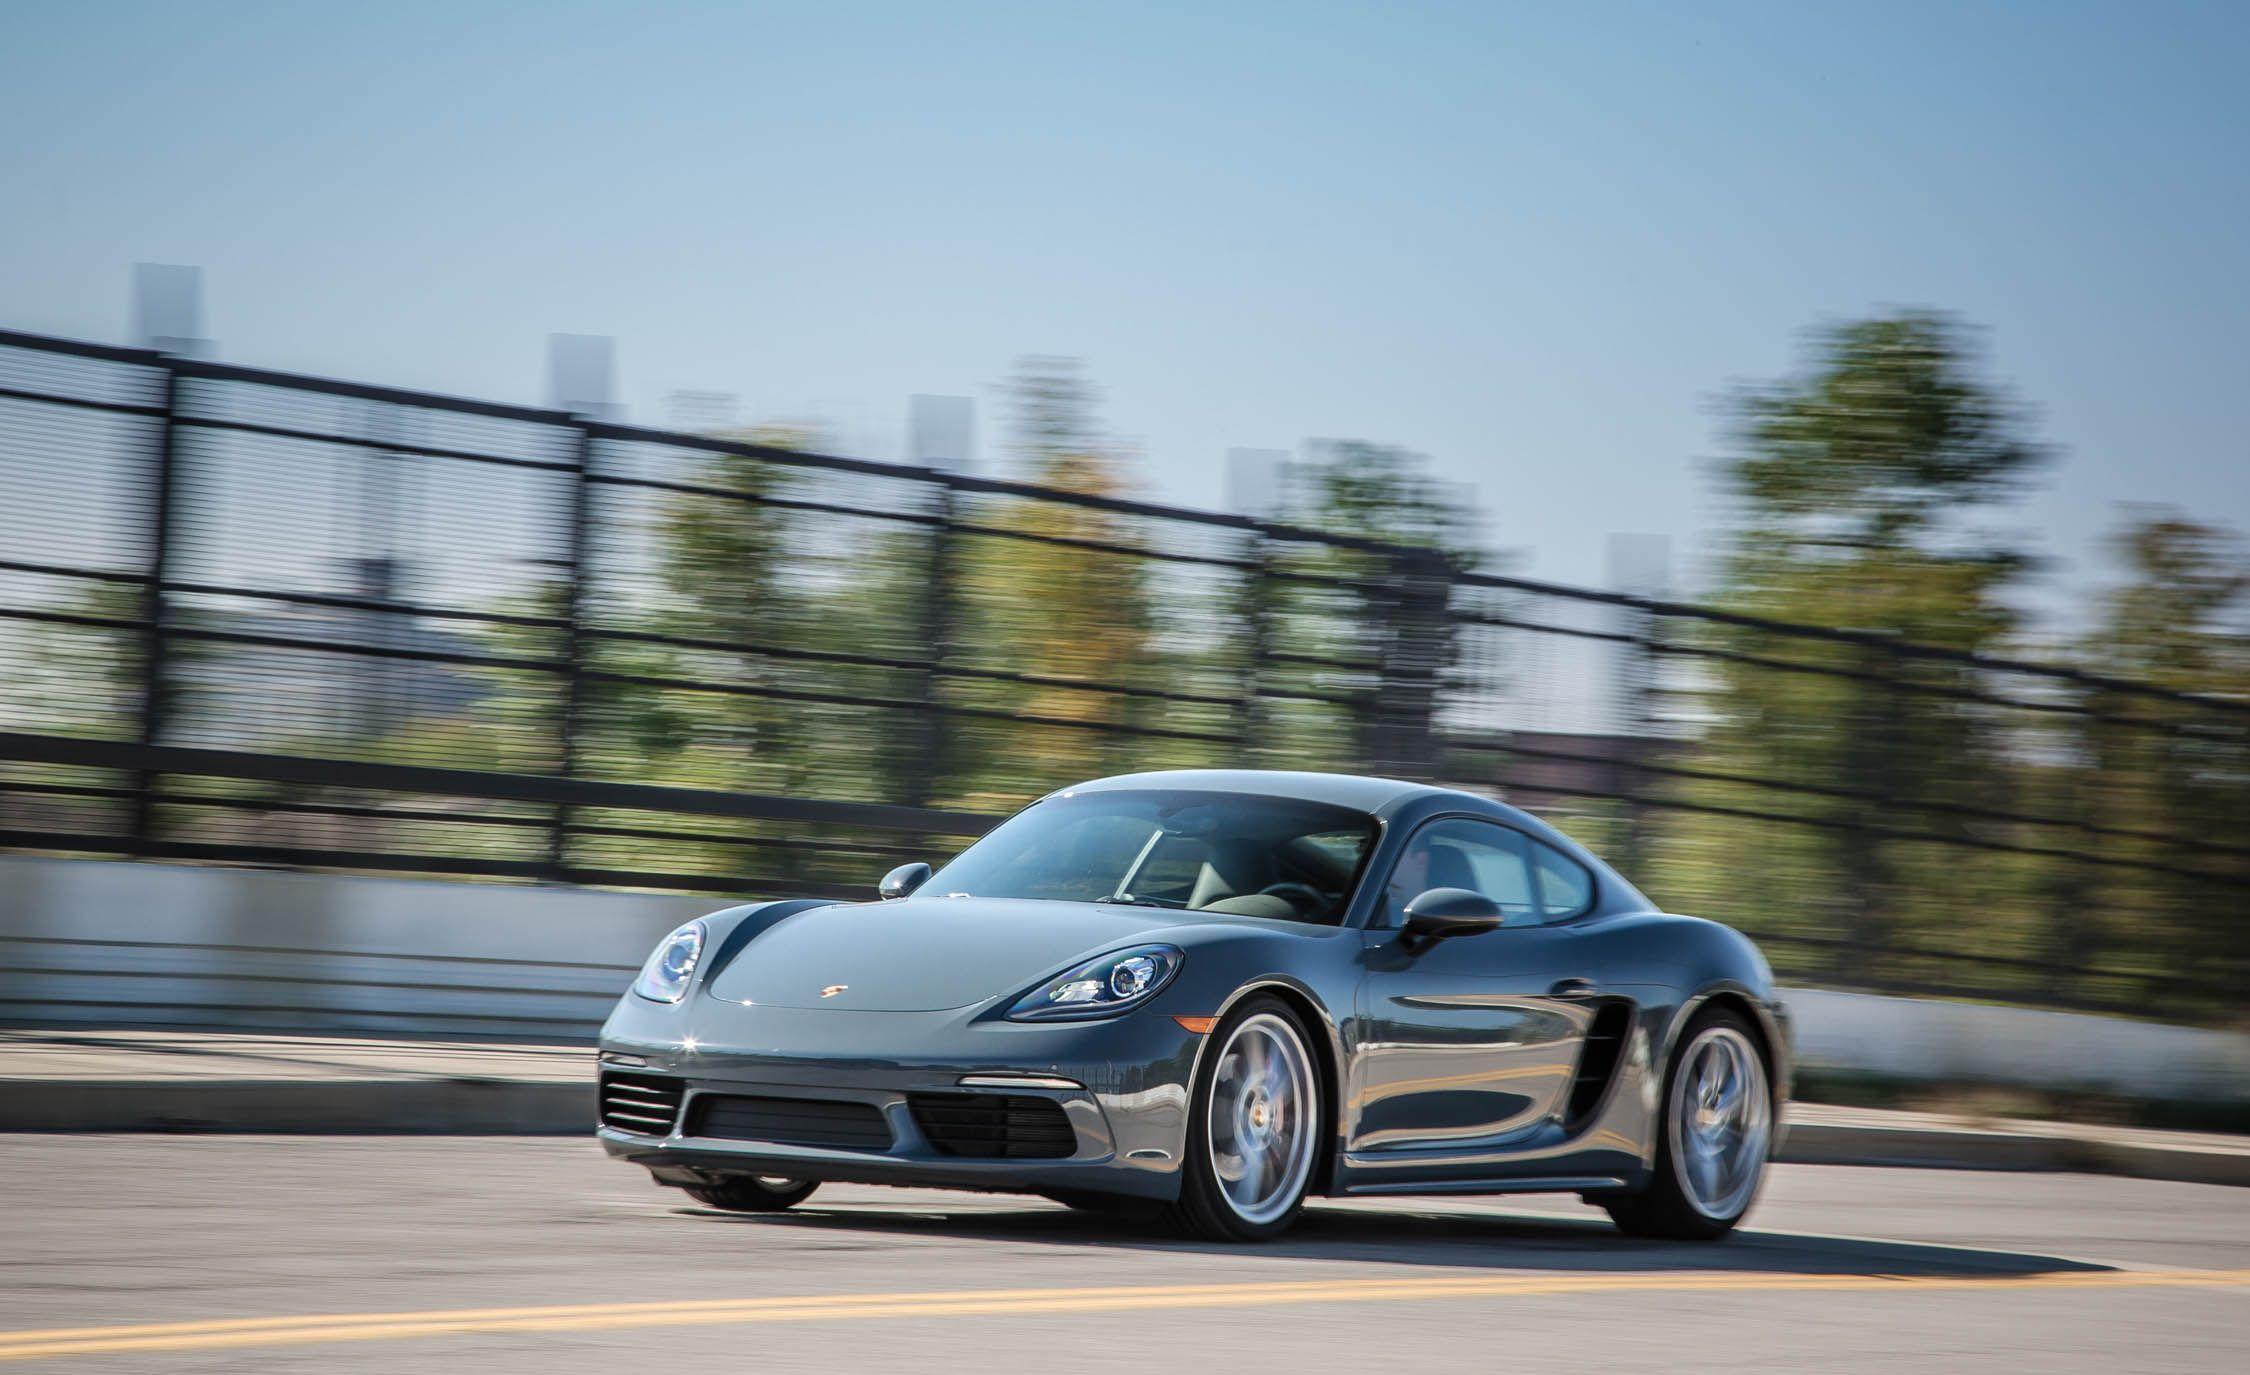 2017 Porsche 718 Cayman S Pdk Test Review Car And Driver